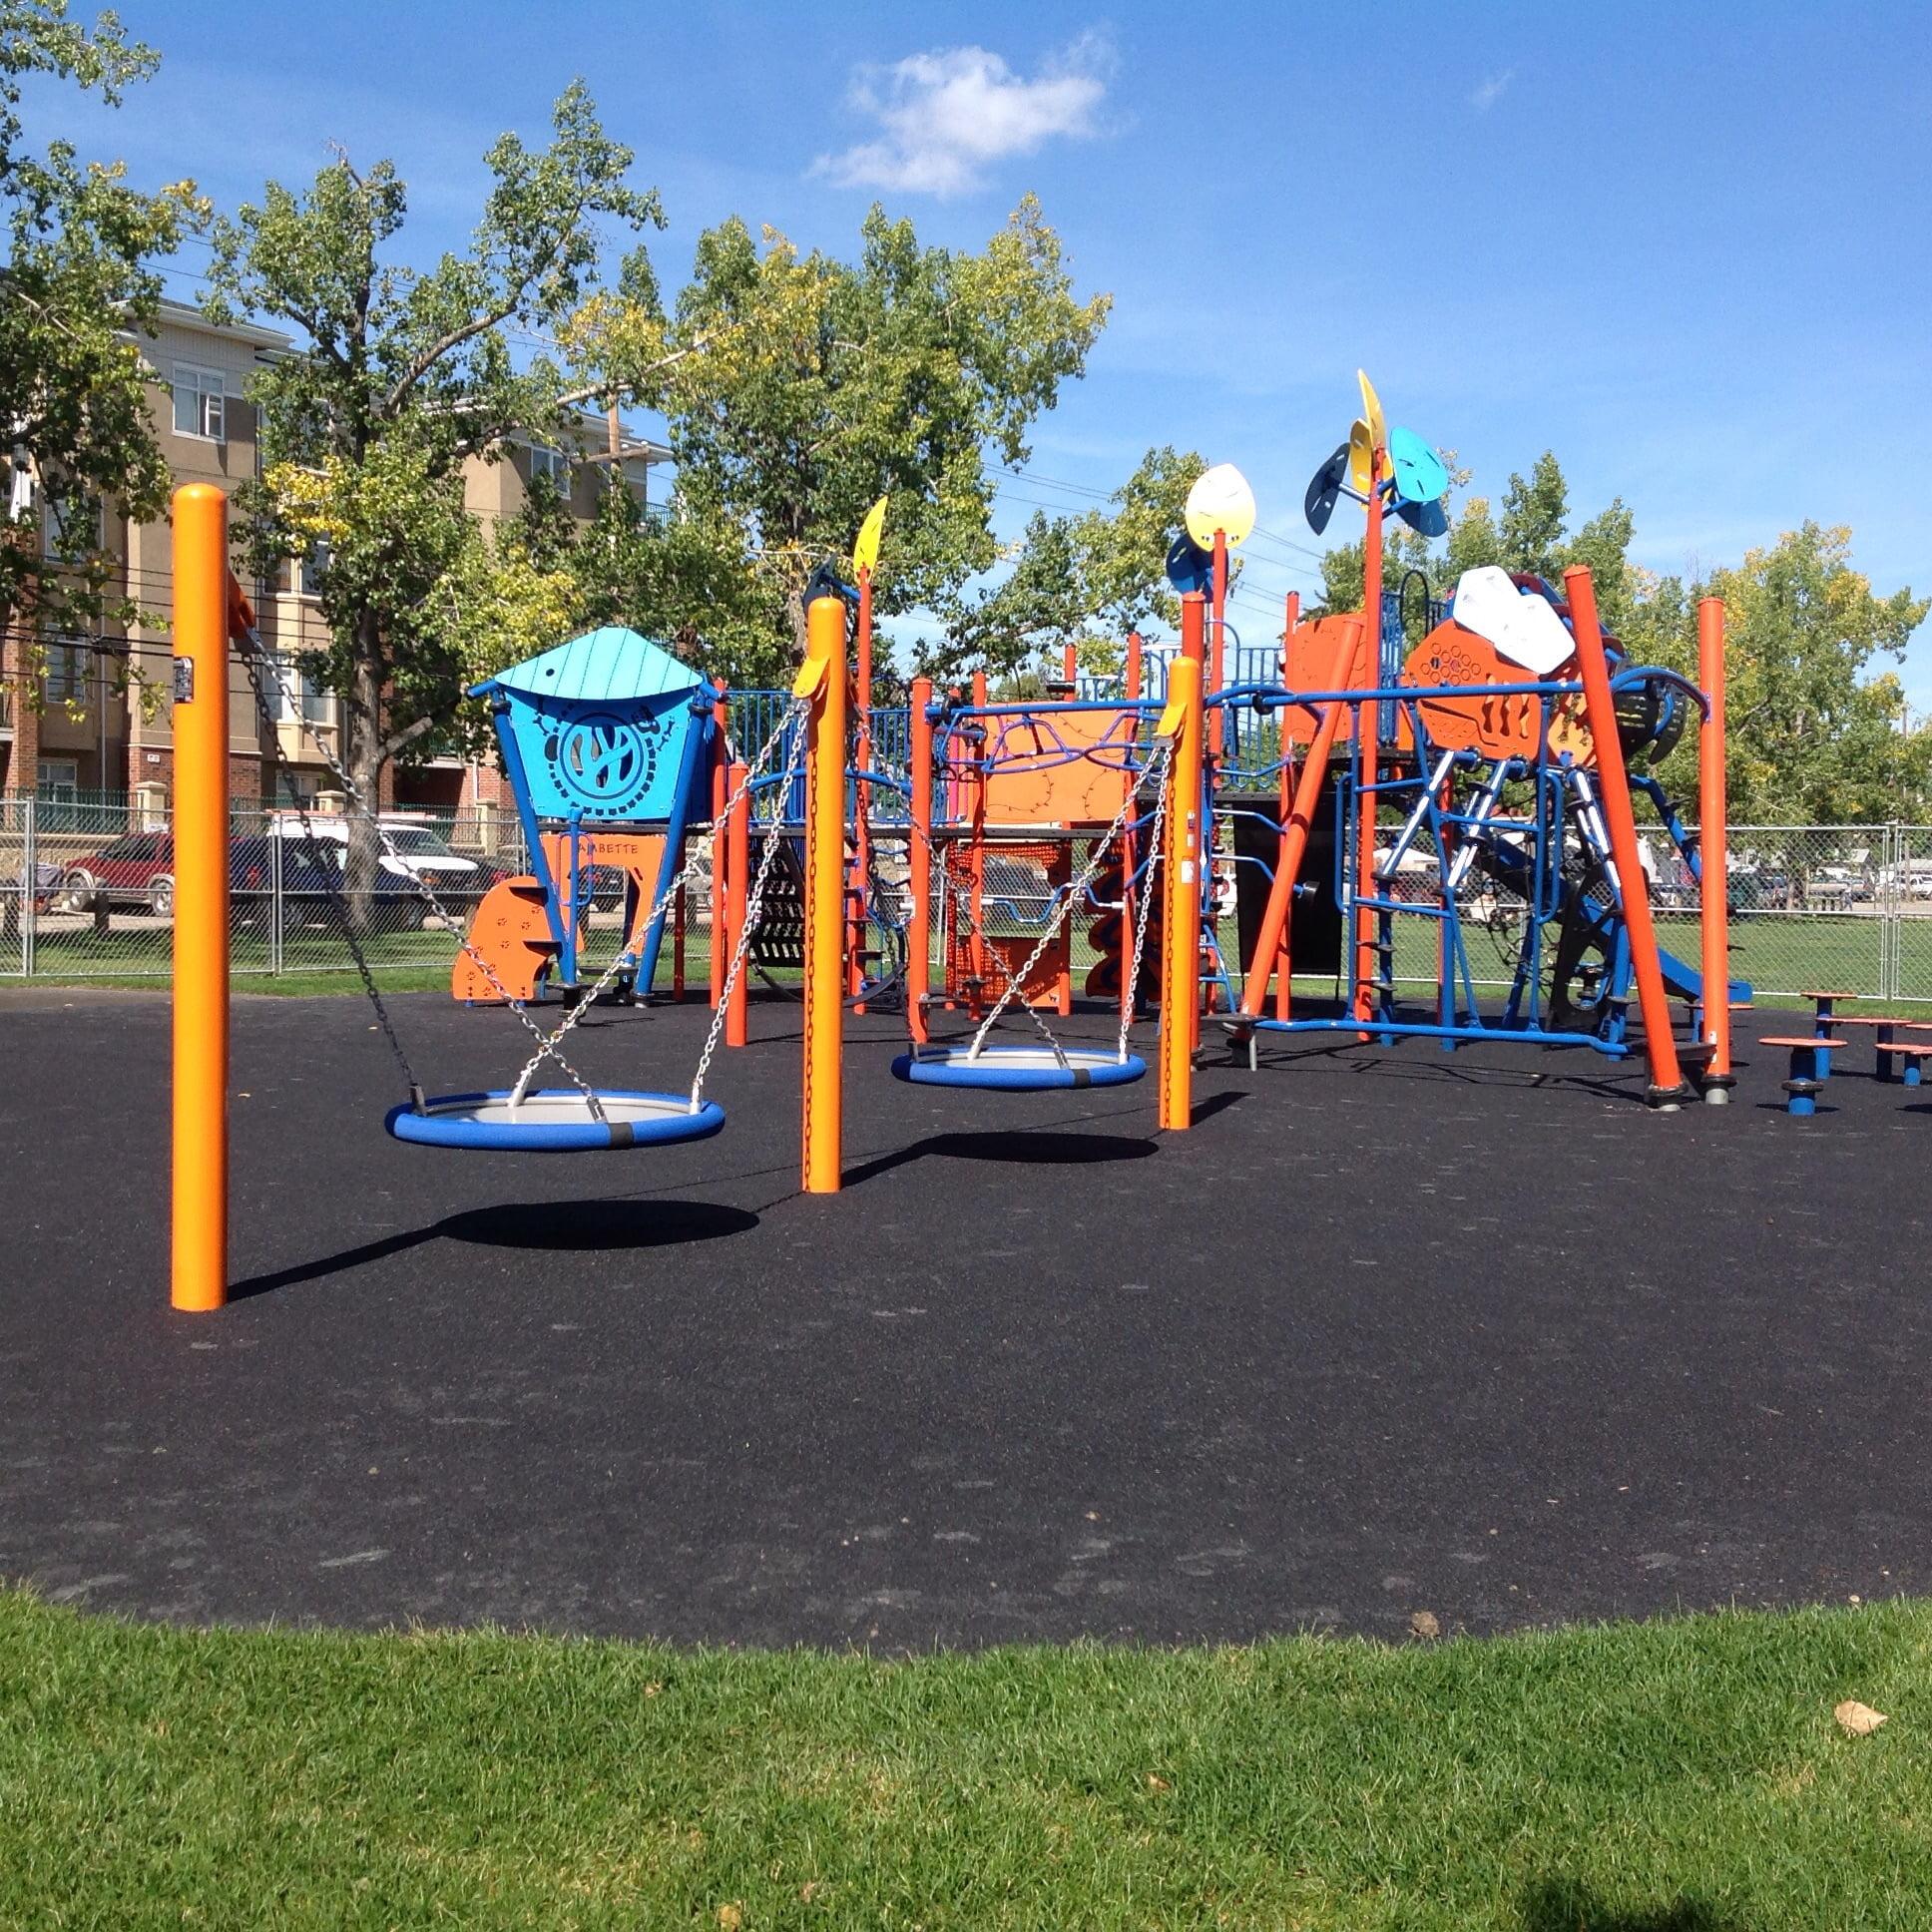 New Playground on the Block